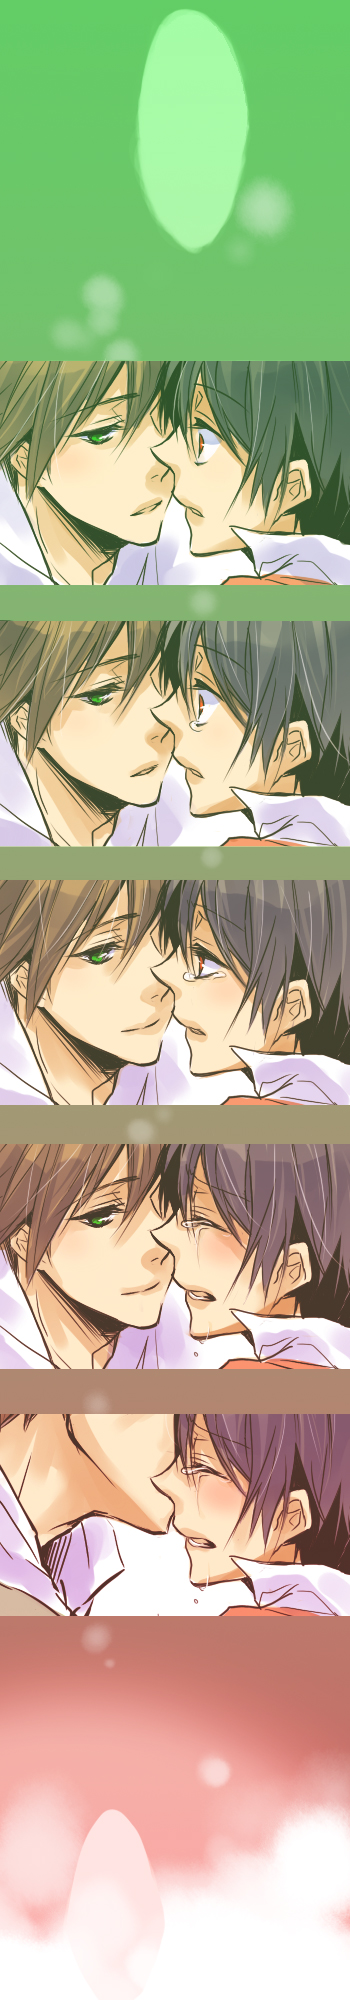 Tags: Anime, Mogmahiru, Pokémon, Green (Pokémon), Red (Pokémon), Comfort, Kiss on the Head, Fanart, Pixiv